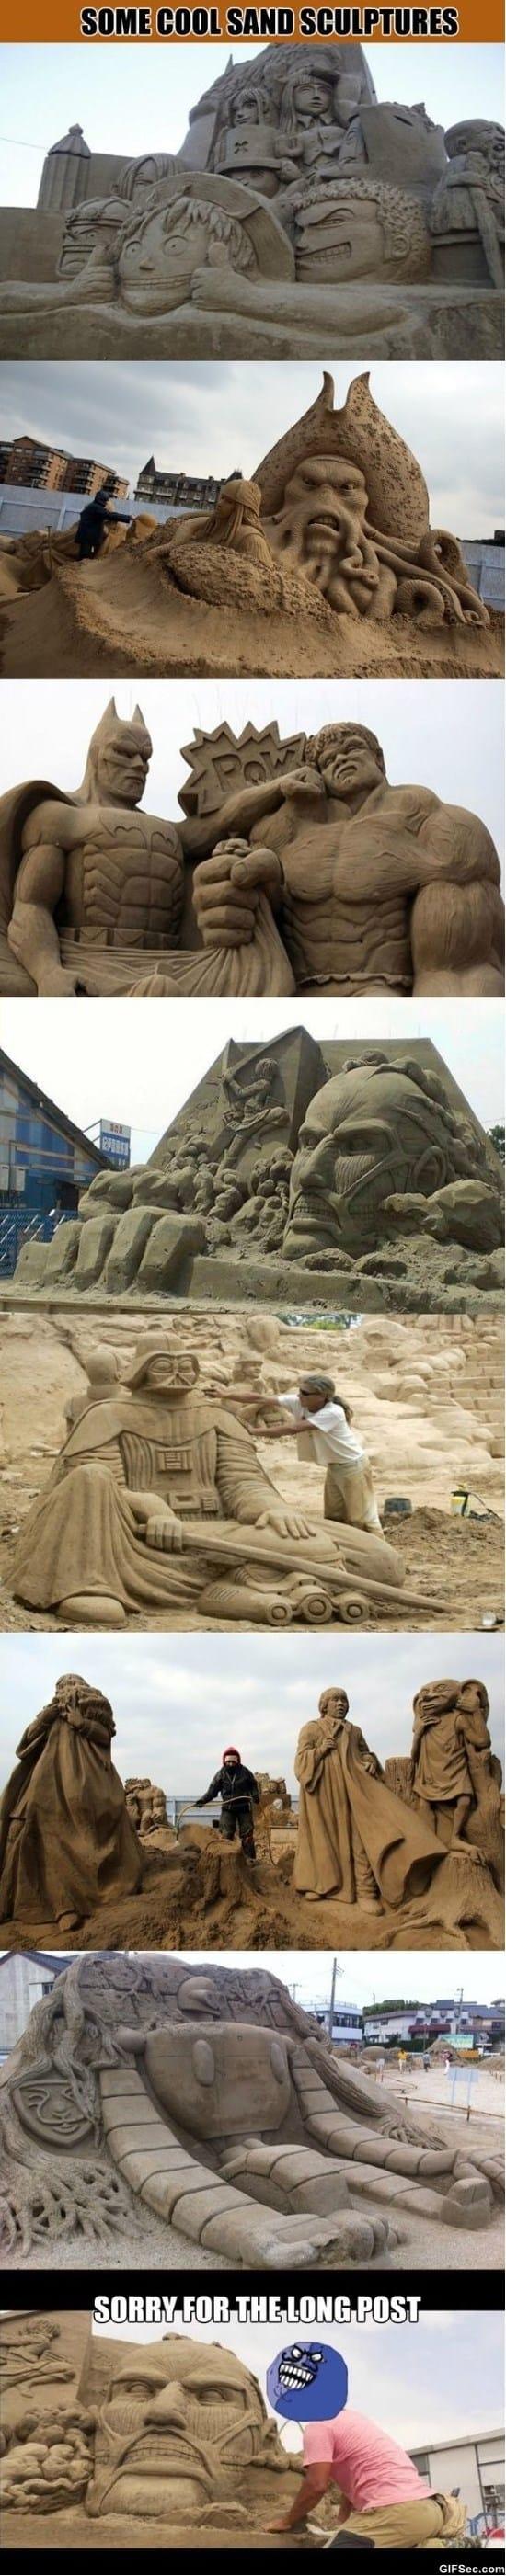 cool-sand-sculptures